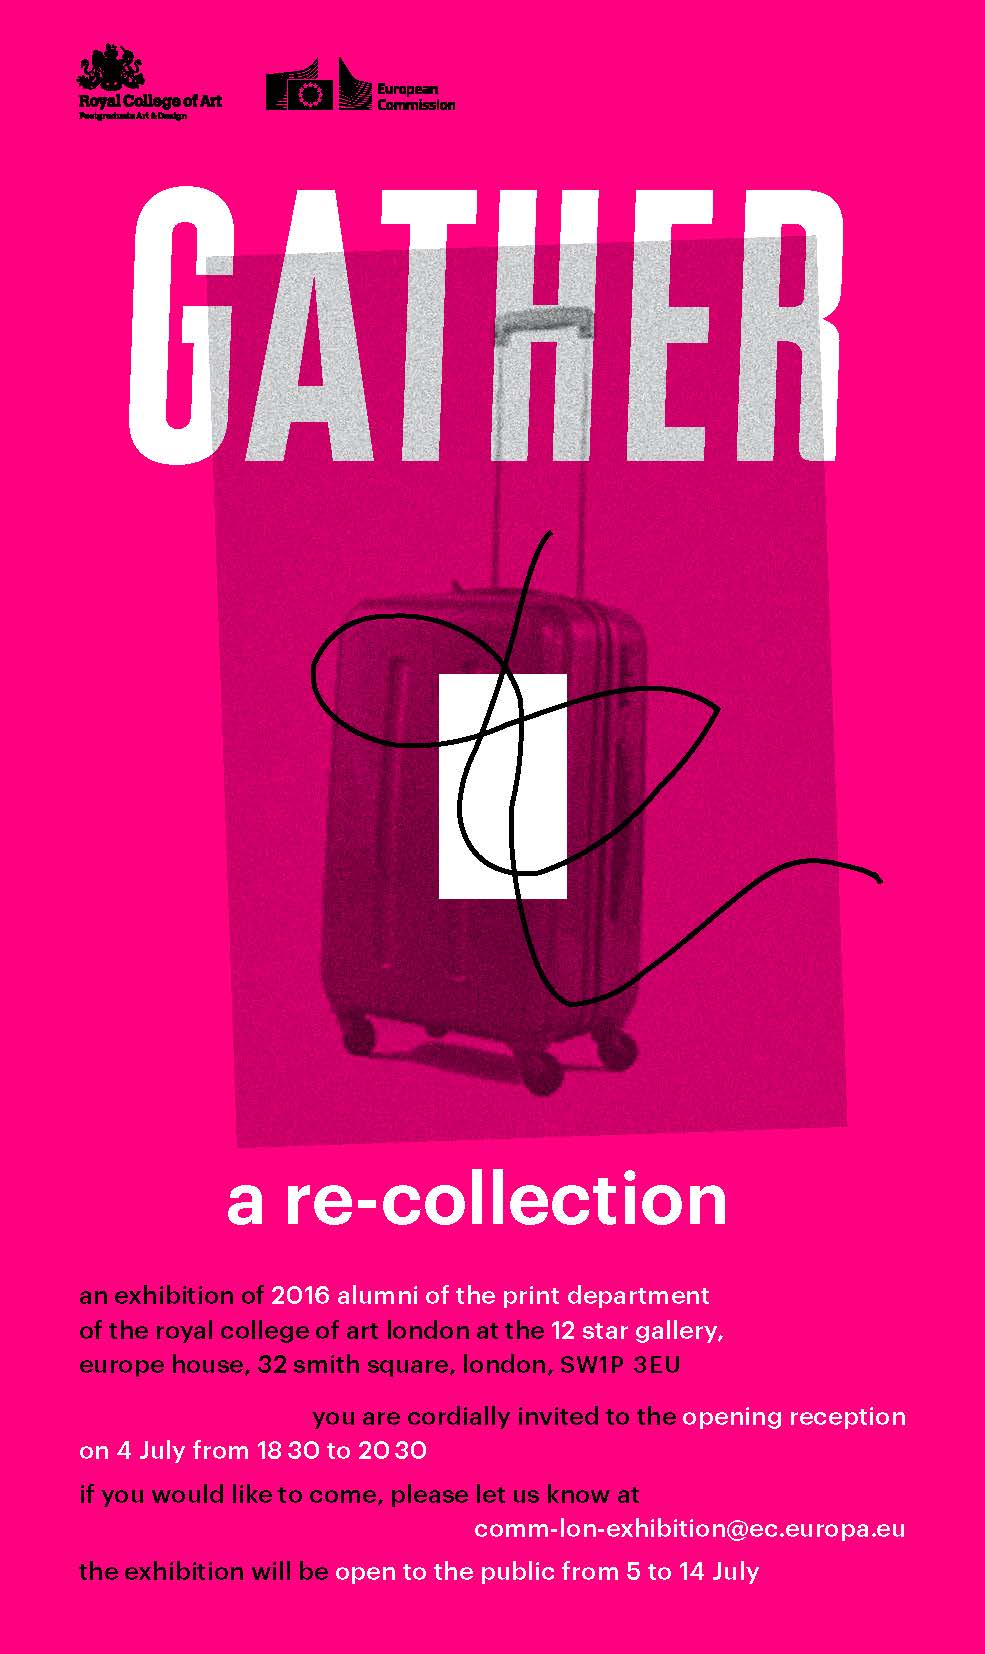 gather_invite.jpg